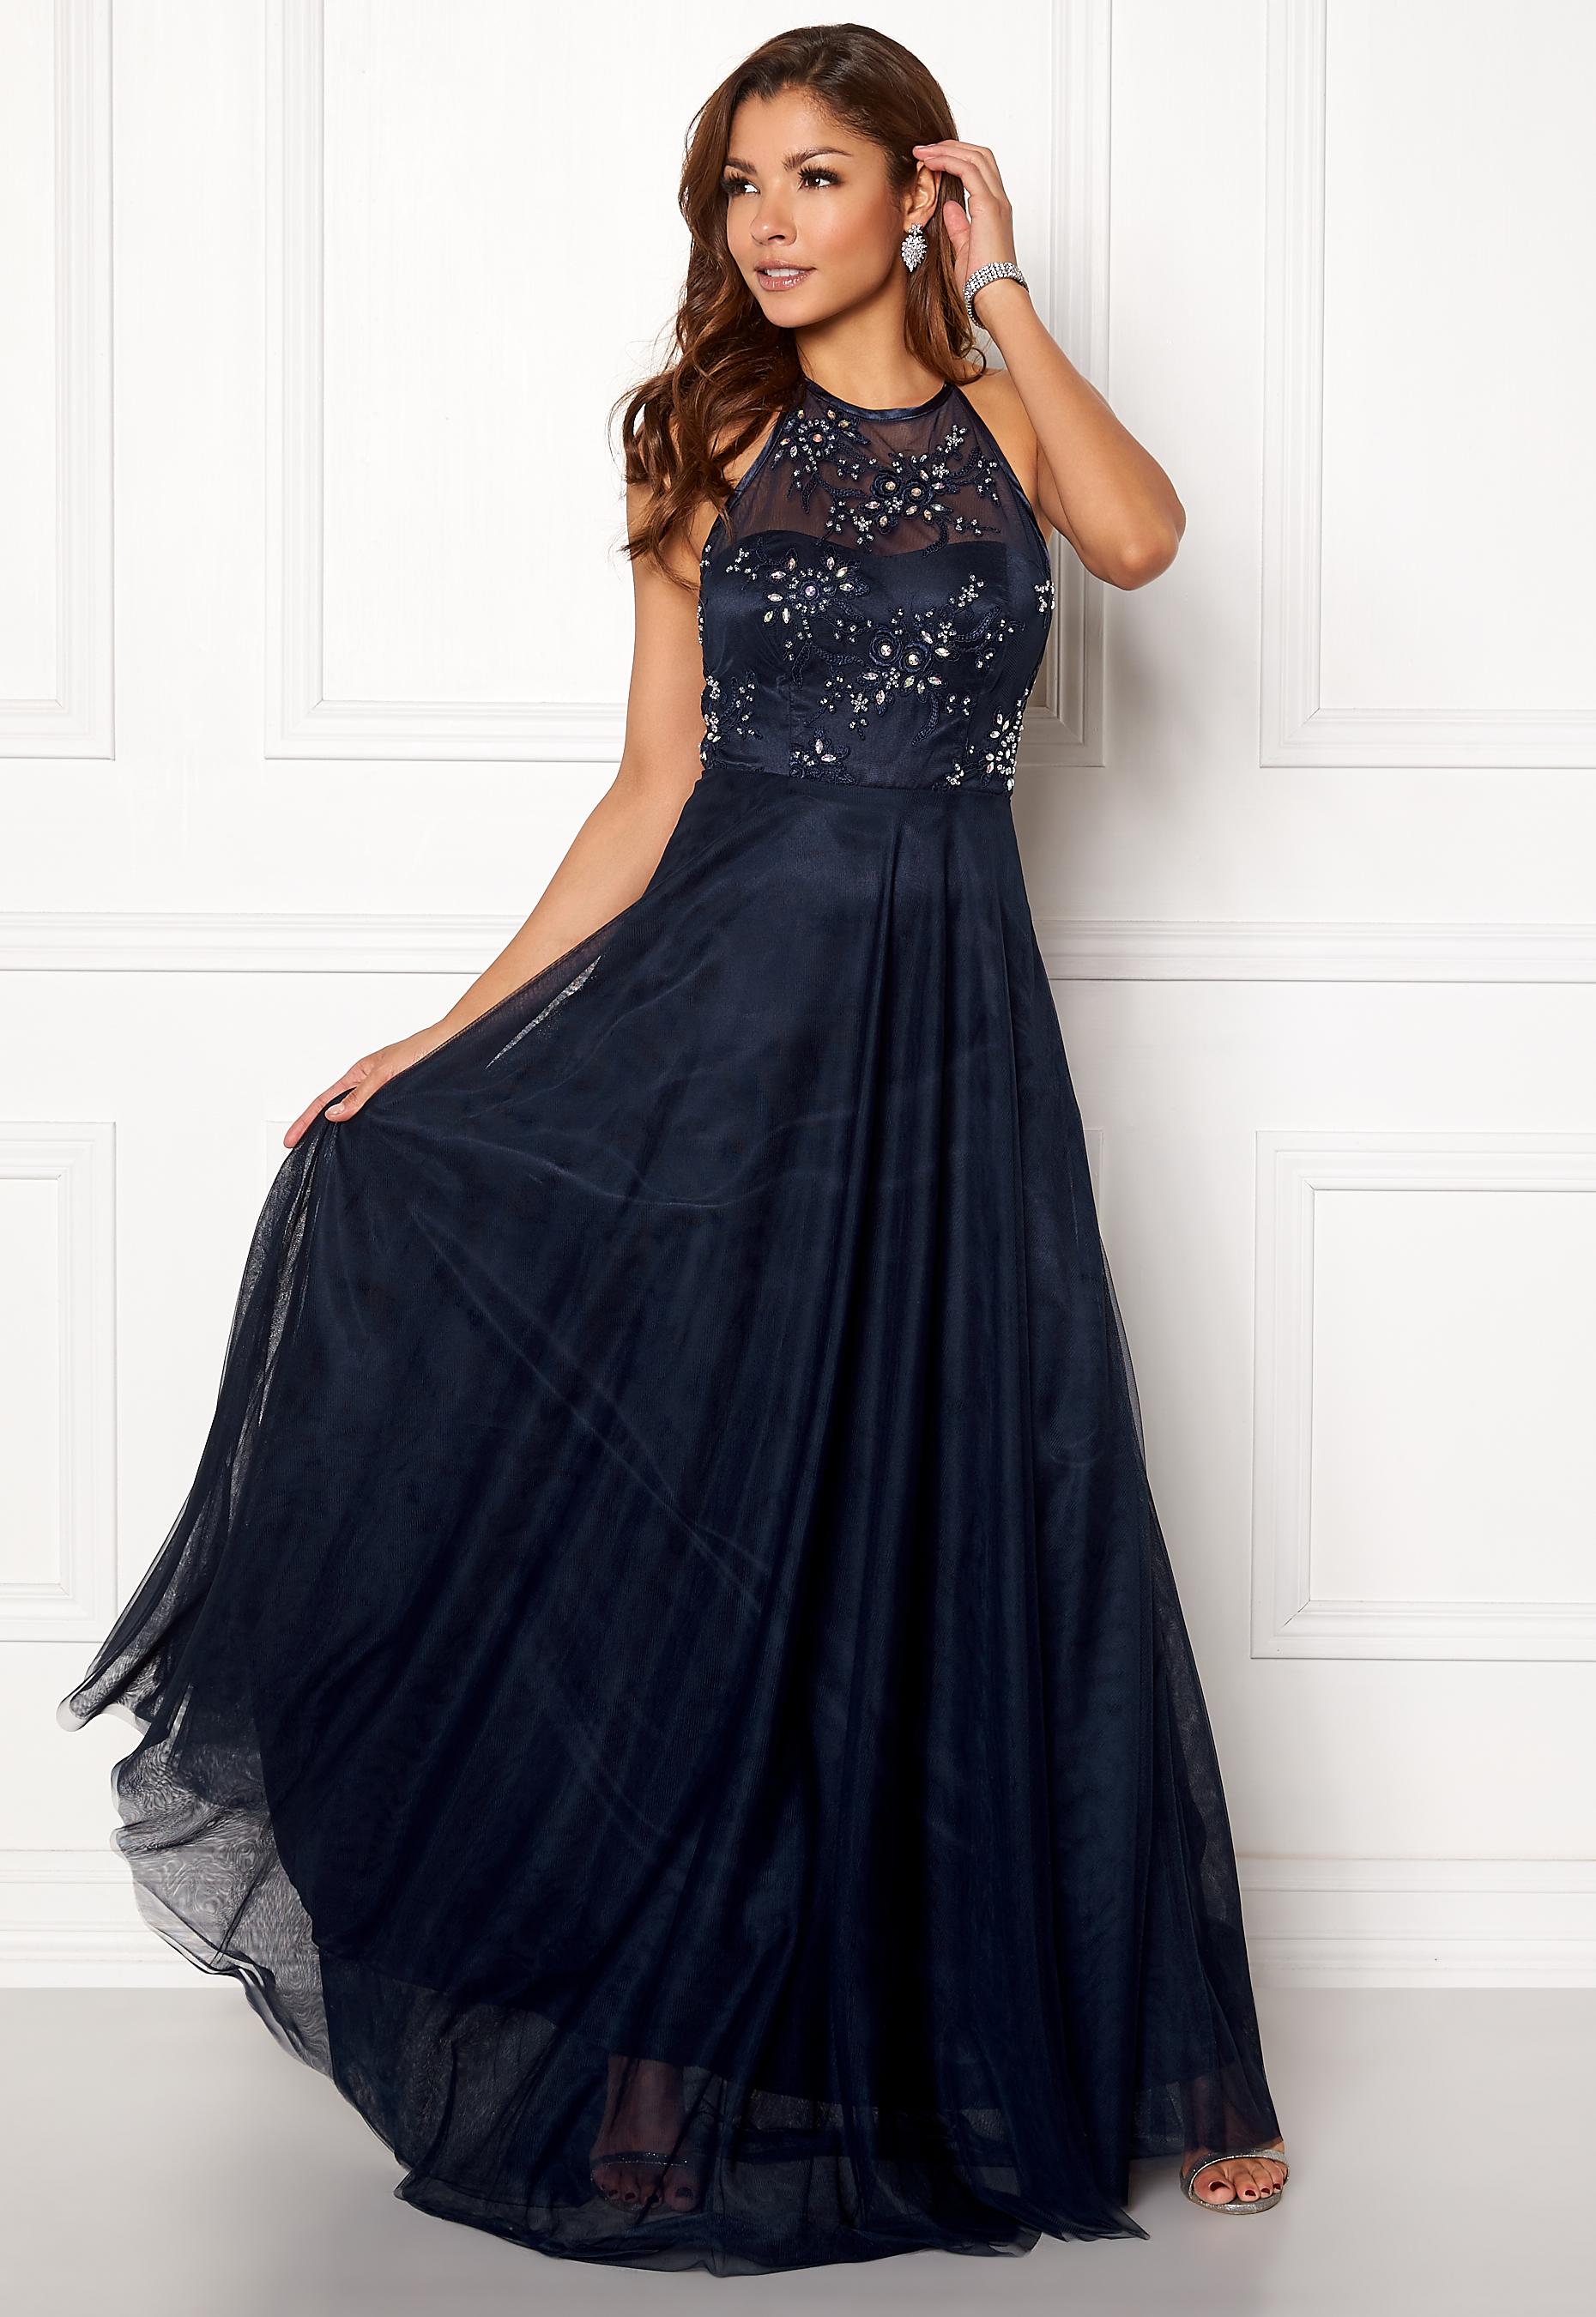 30e8de3f24b7 Chiara Forthi Briley Halterneck Gown Dark blue - Bubbleroom